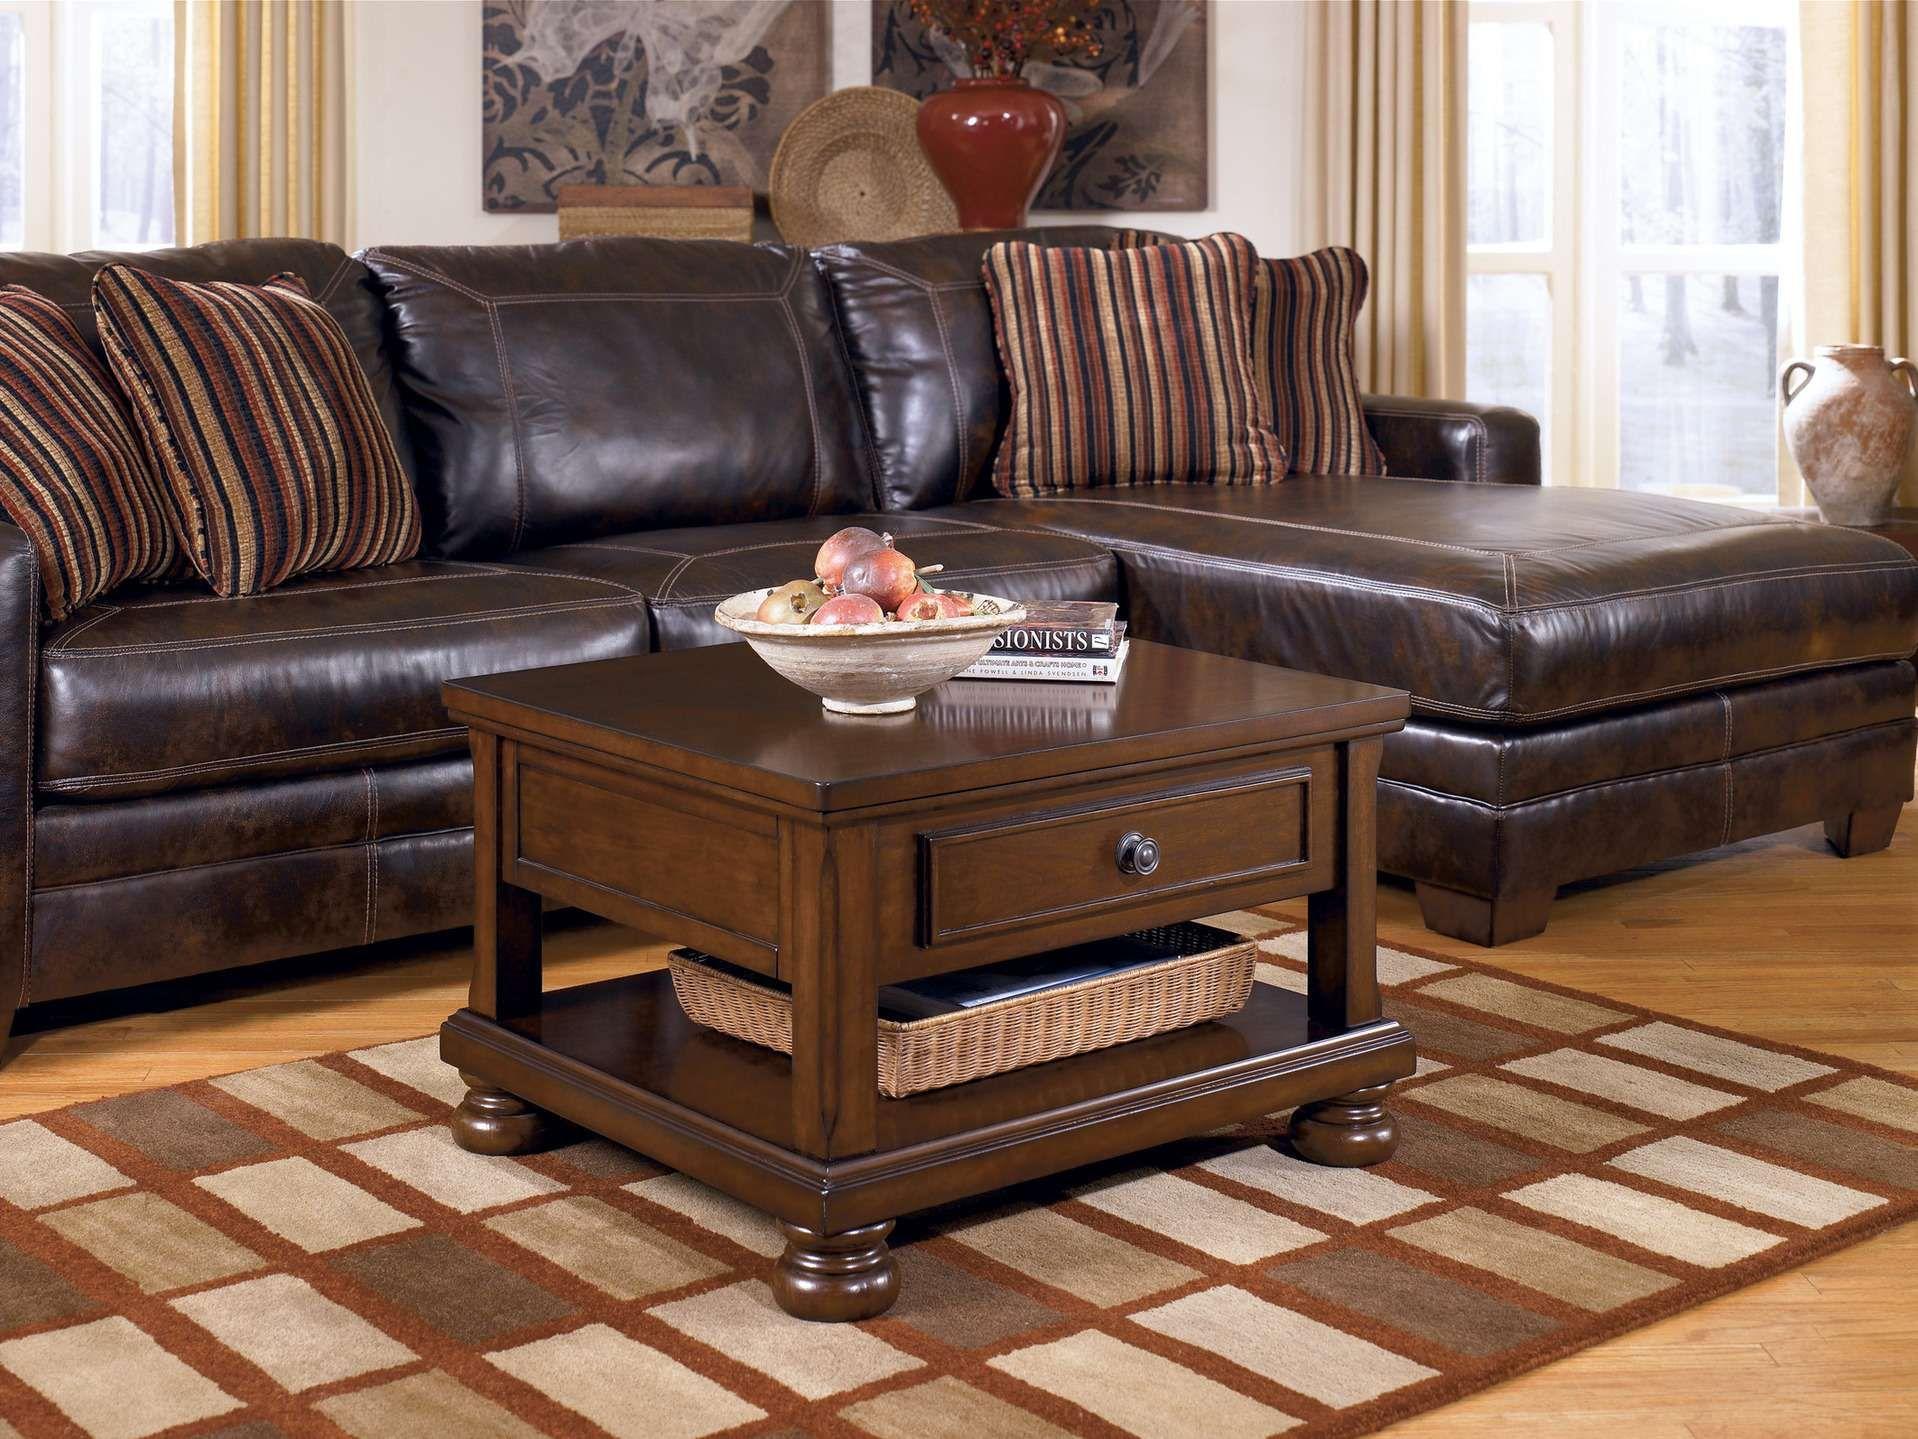 rustic living room furniture sets. Rustic Living Room Table Sets: Cheap Yet Amazing . Furniture Sets O